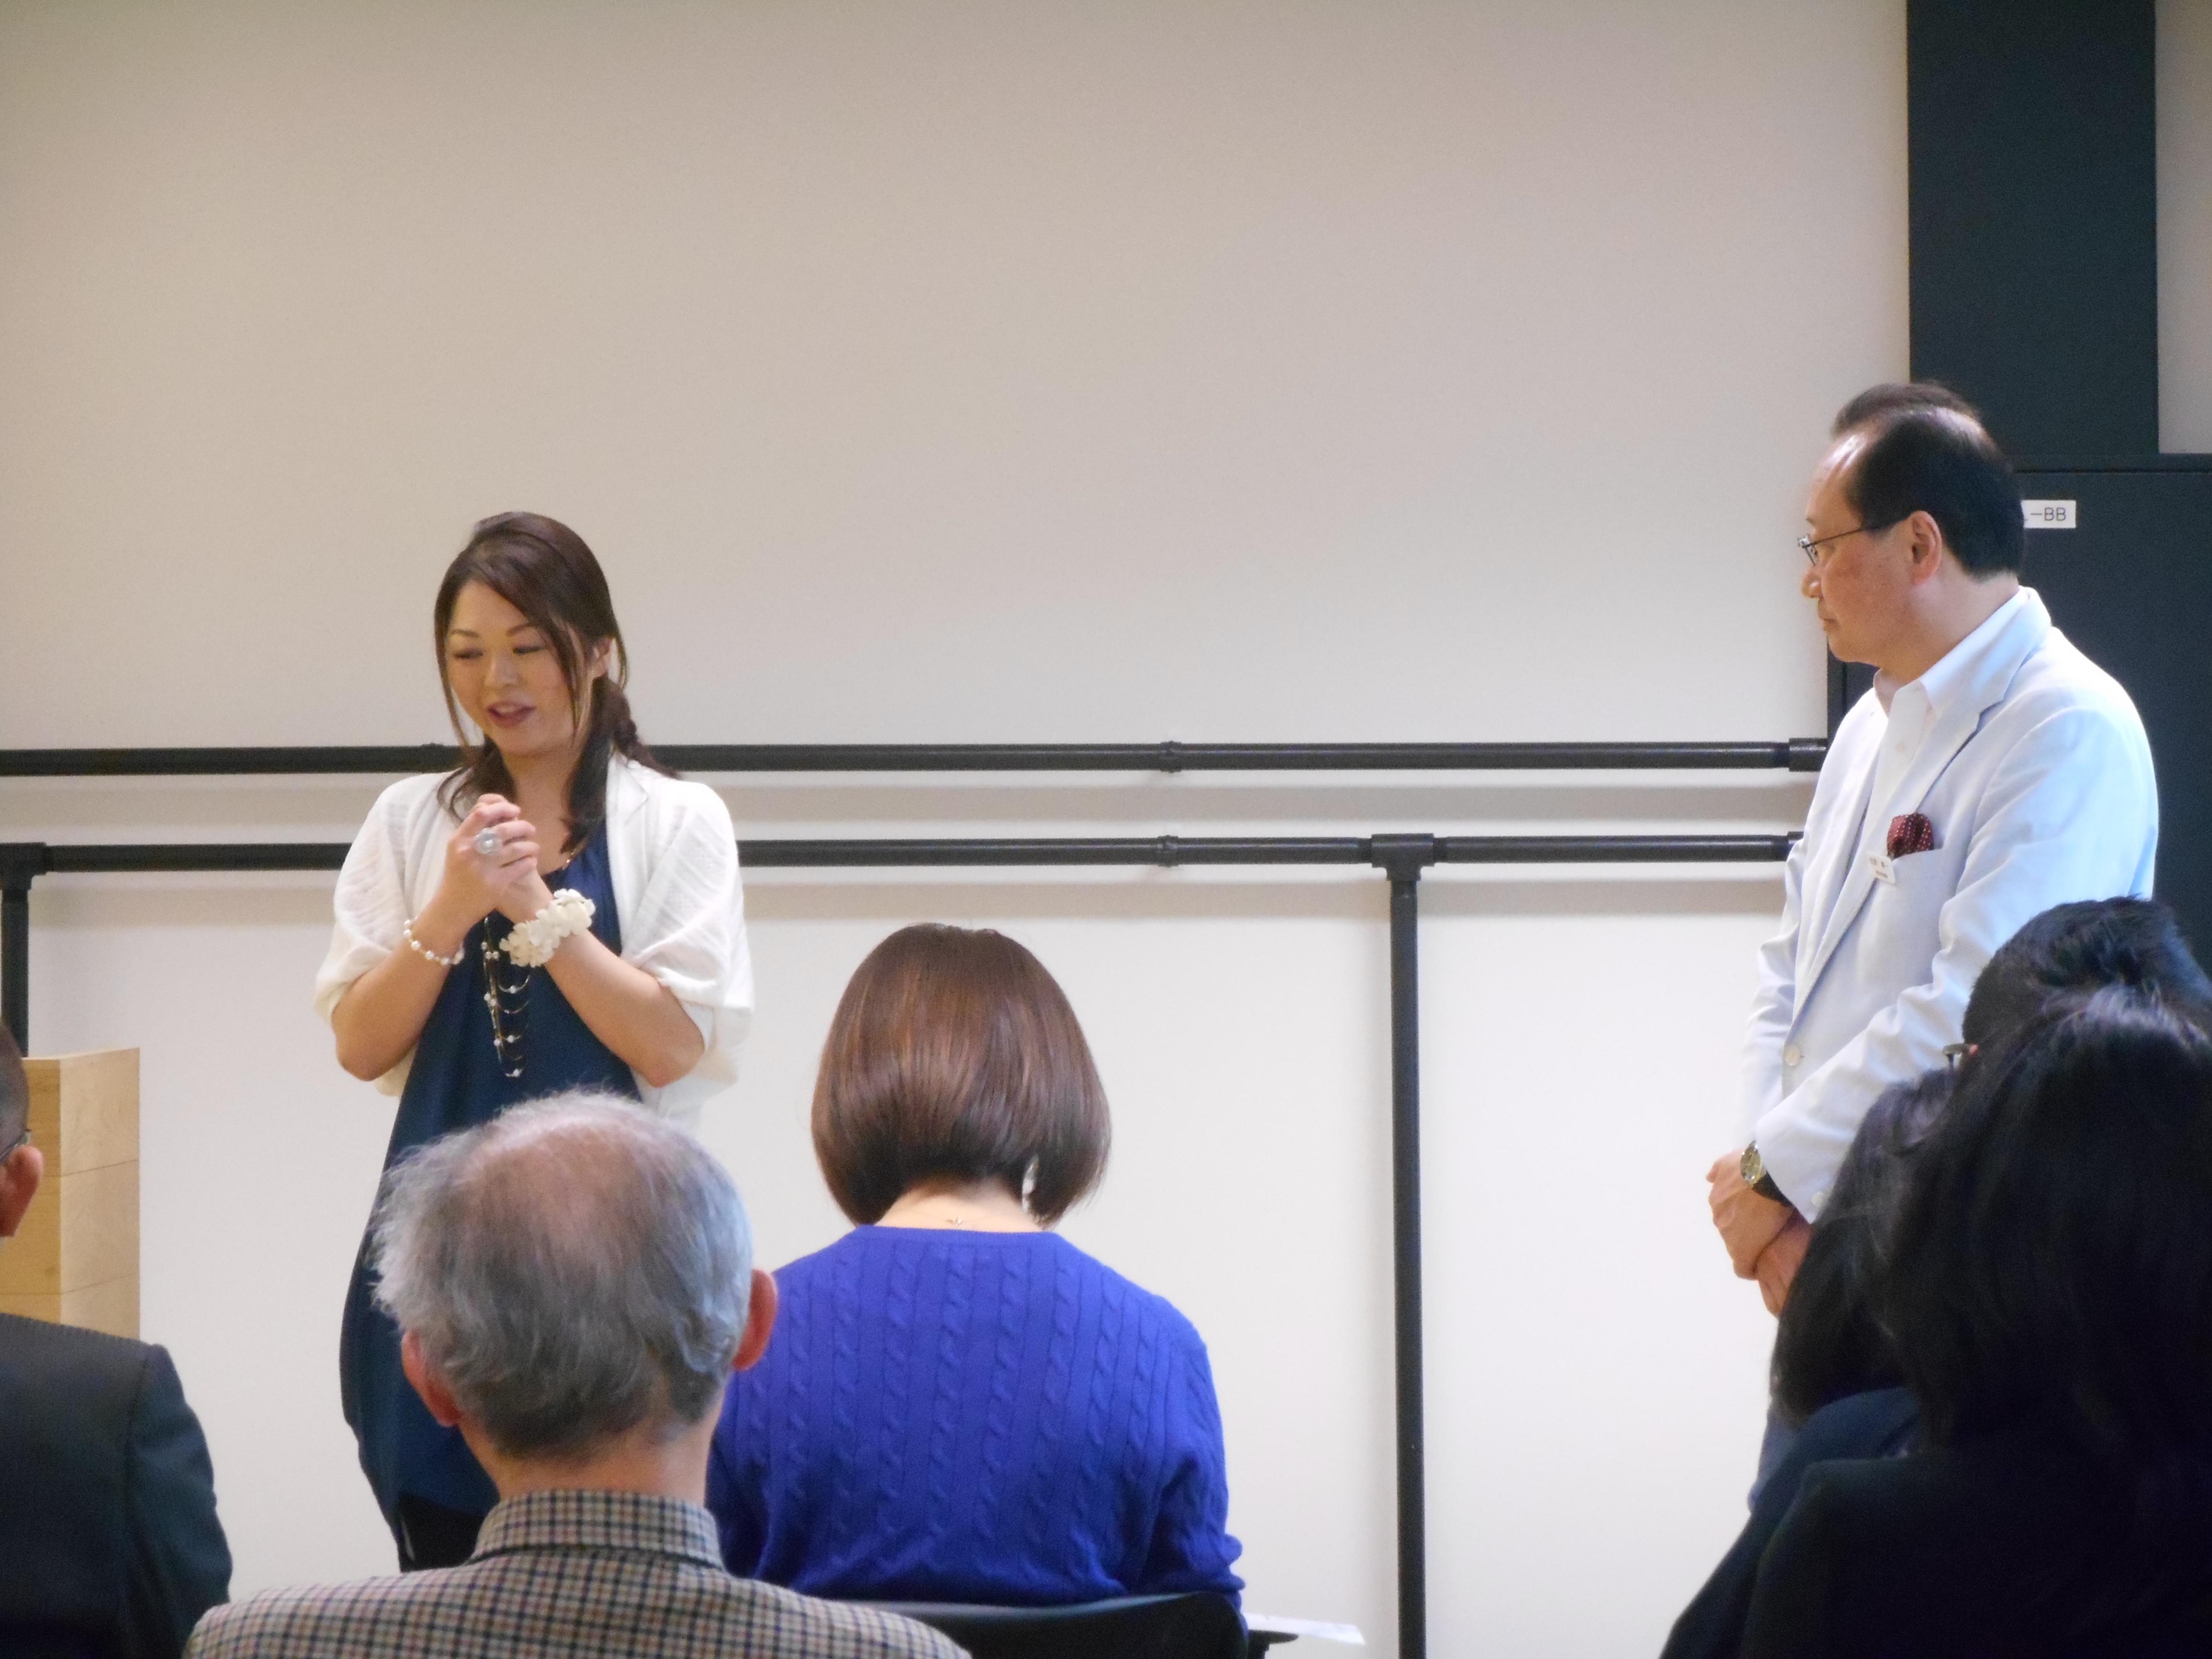 DSCN3716 1 - 4月1日東京思風塾の開催になります。